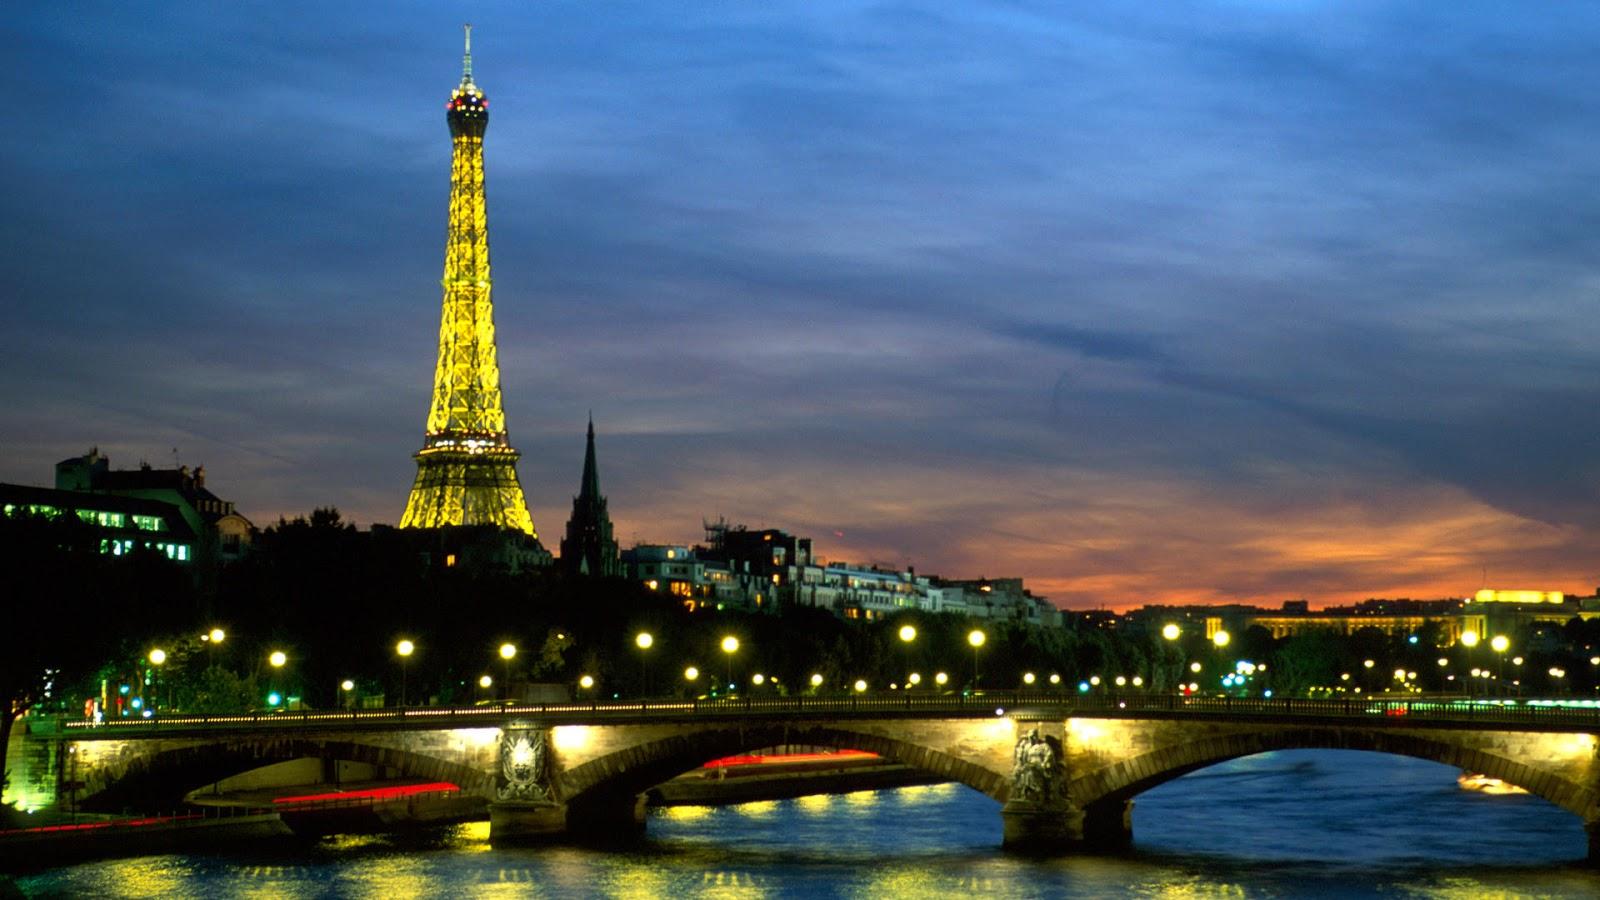 WALLPAPER ANDROID IPHONE Wallpaper Menara Eiffel Malam Hari